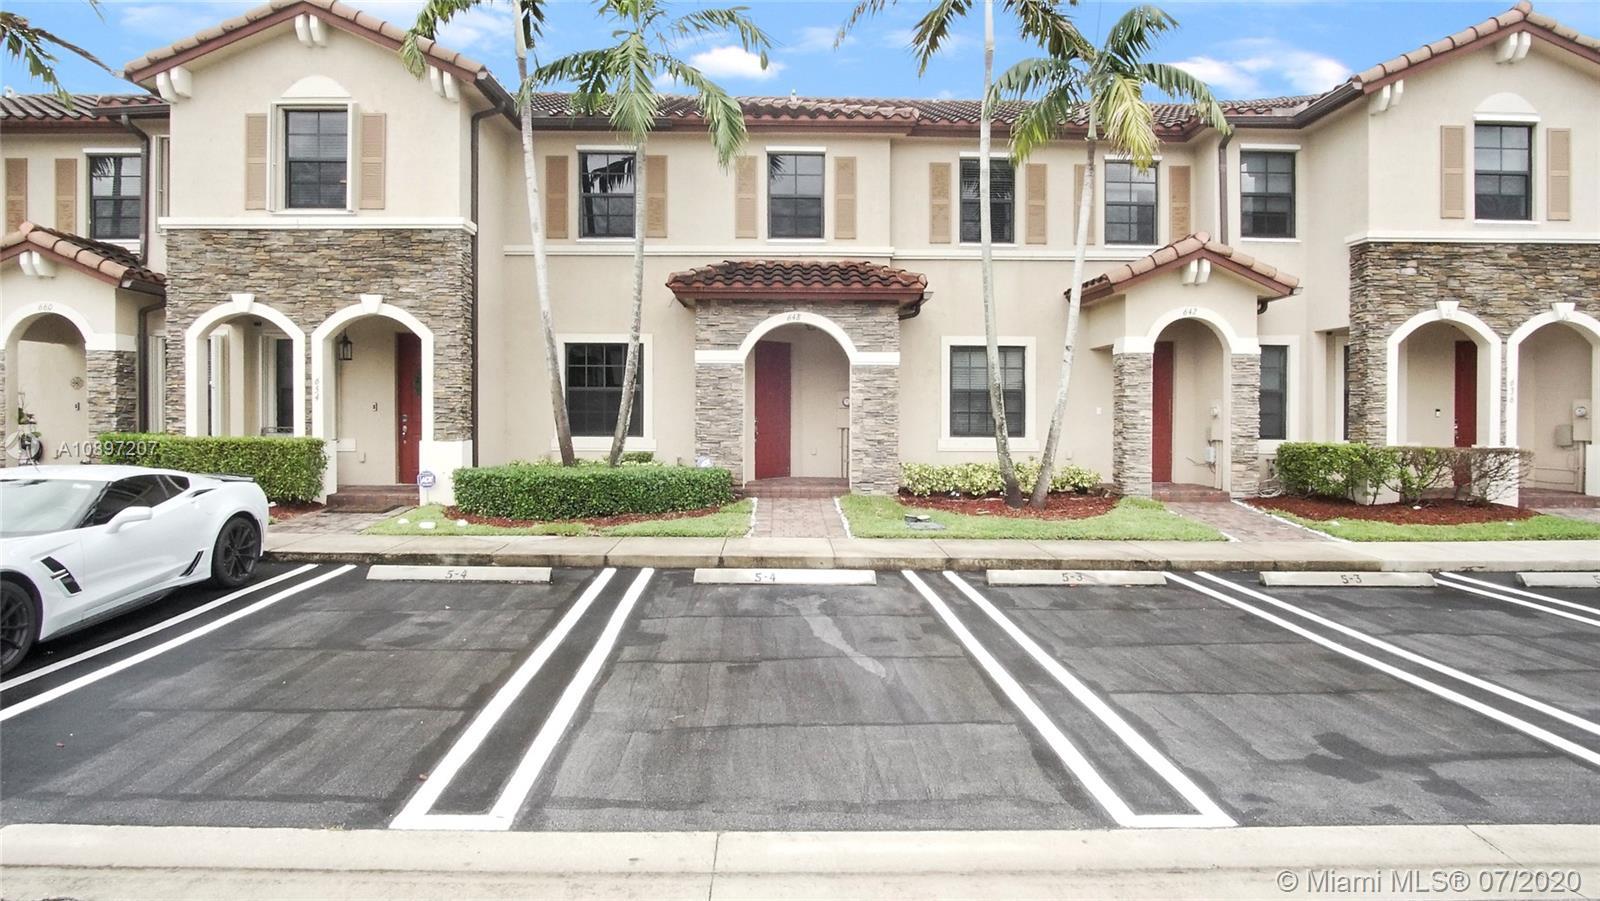 648 SE 32nd Ave #648 Property Photo - Homestead, FL real estate listing